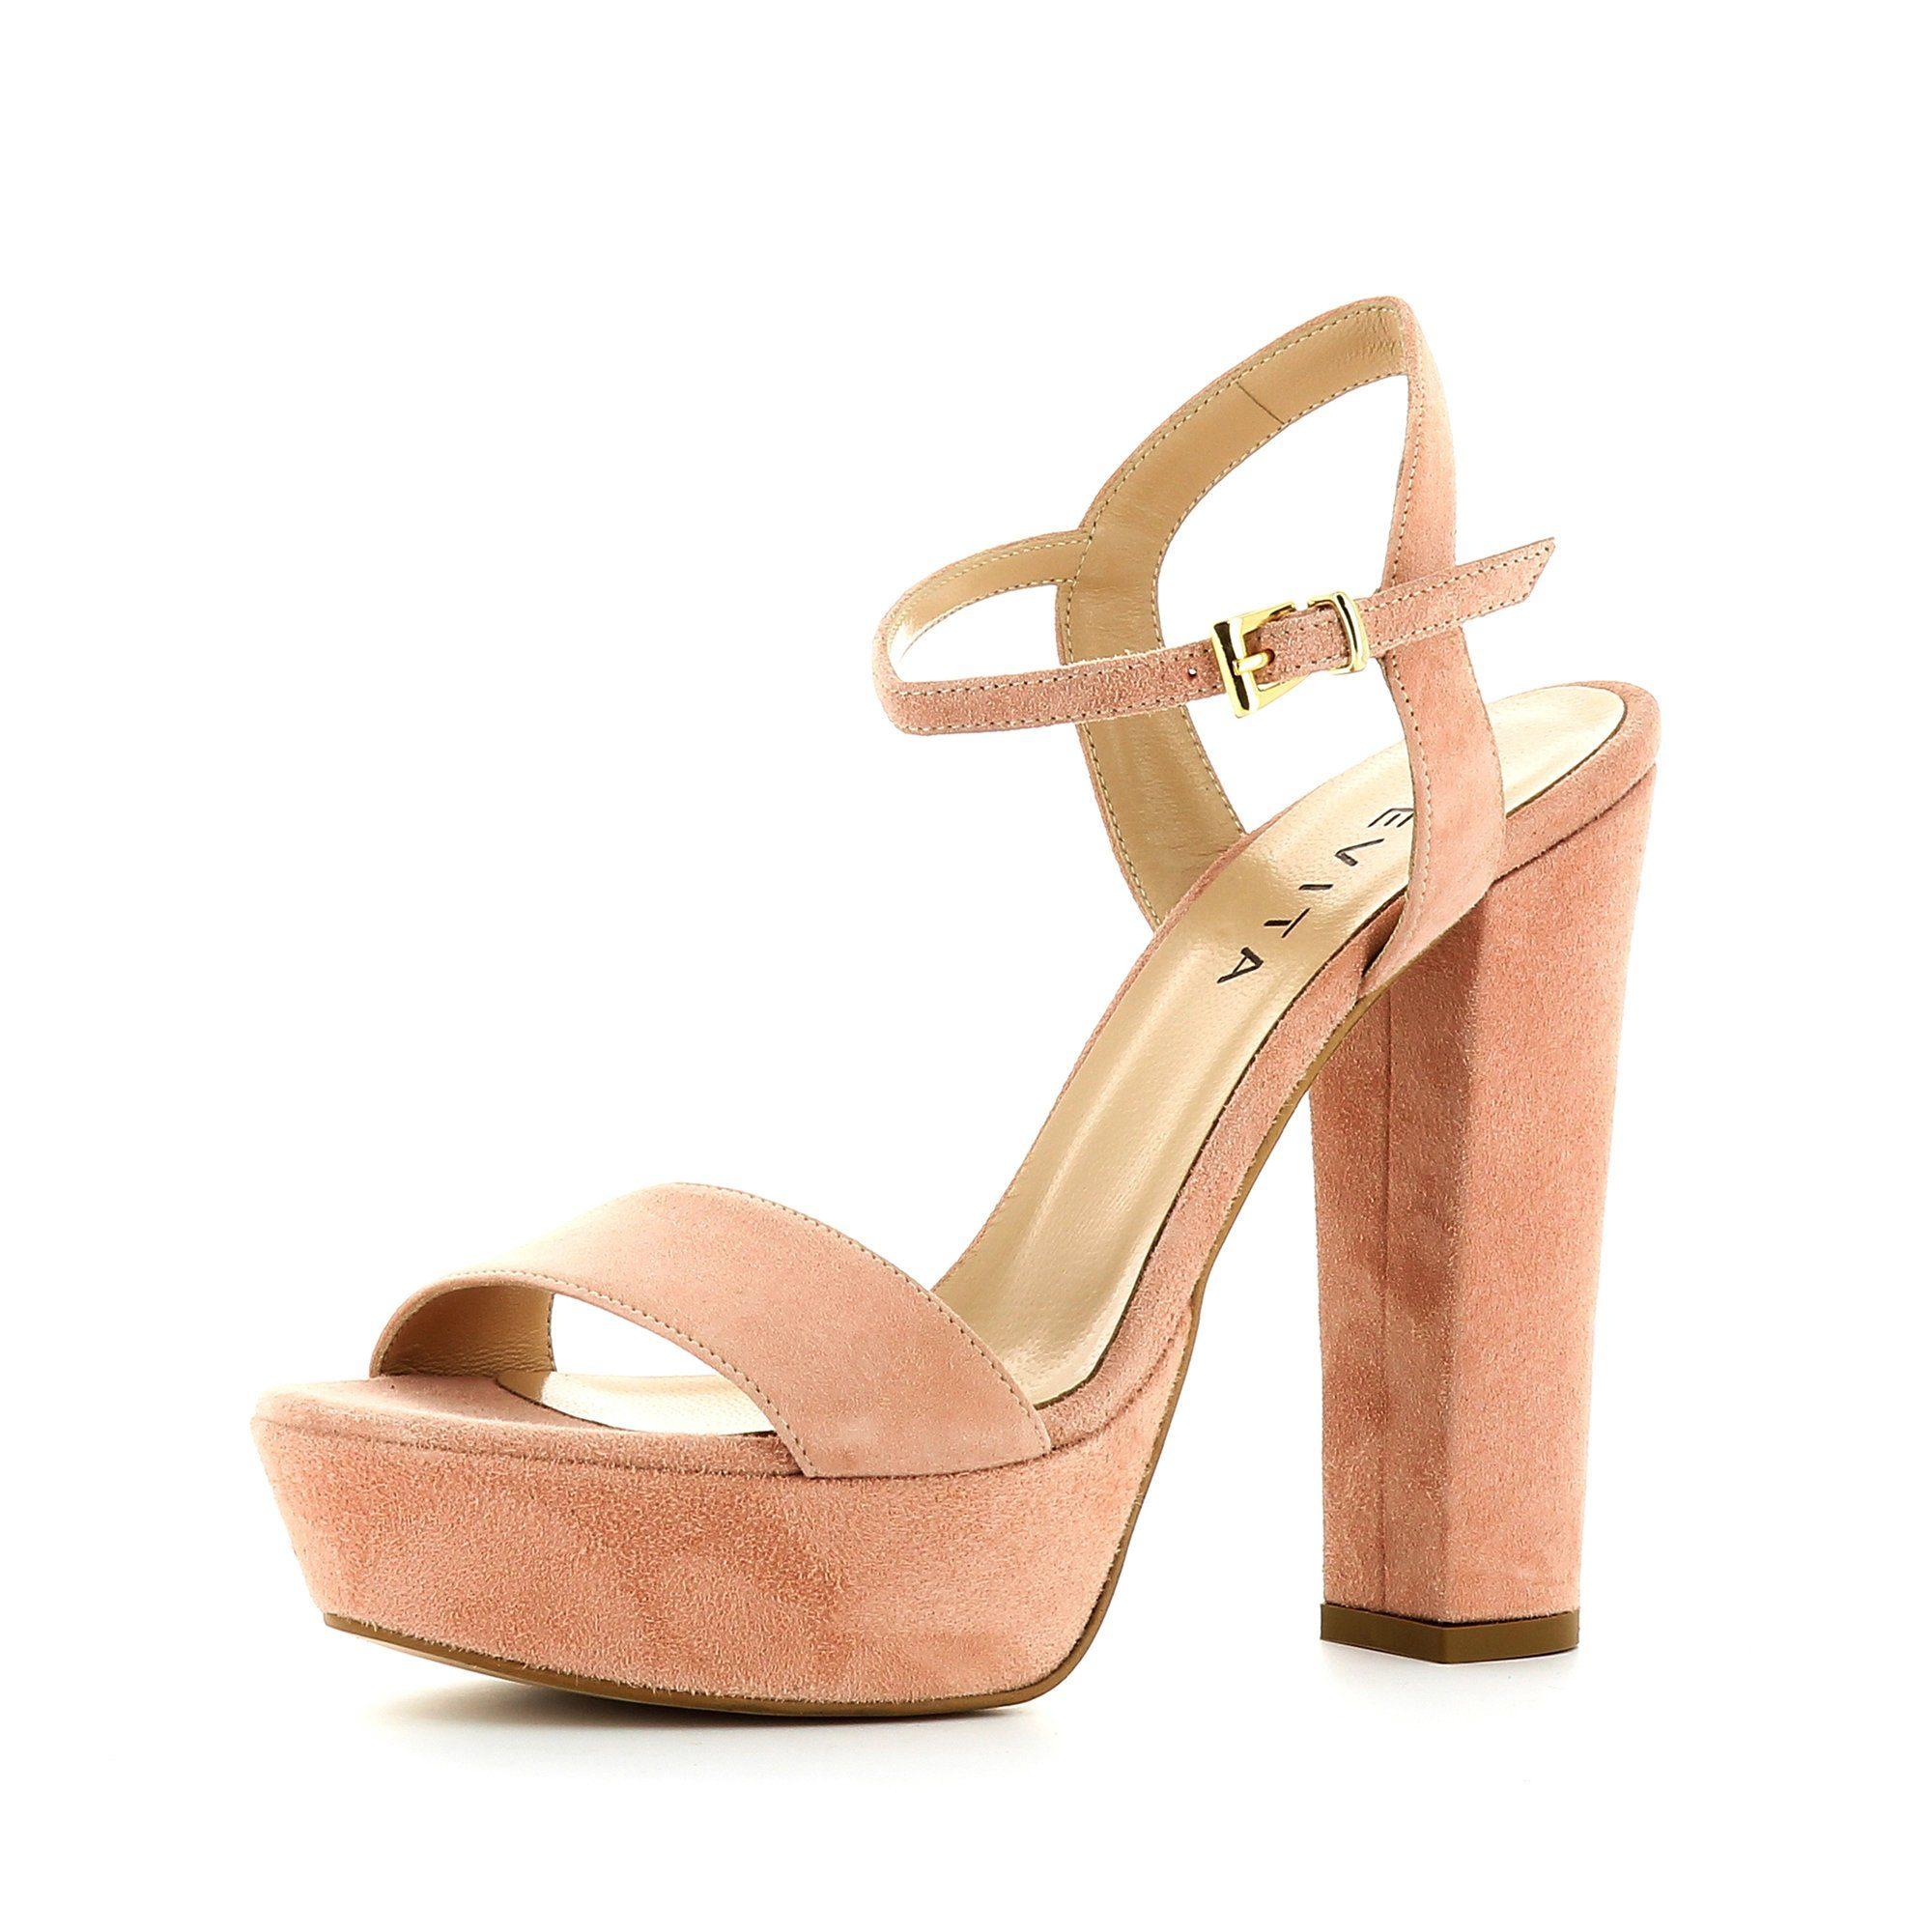 Evita STEFANIA High-Heel-Sandalette kaufen  rosa